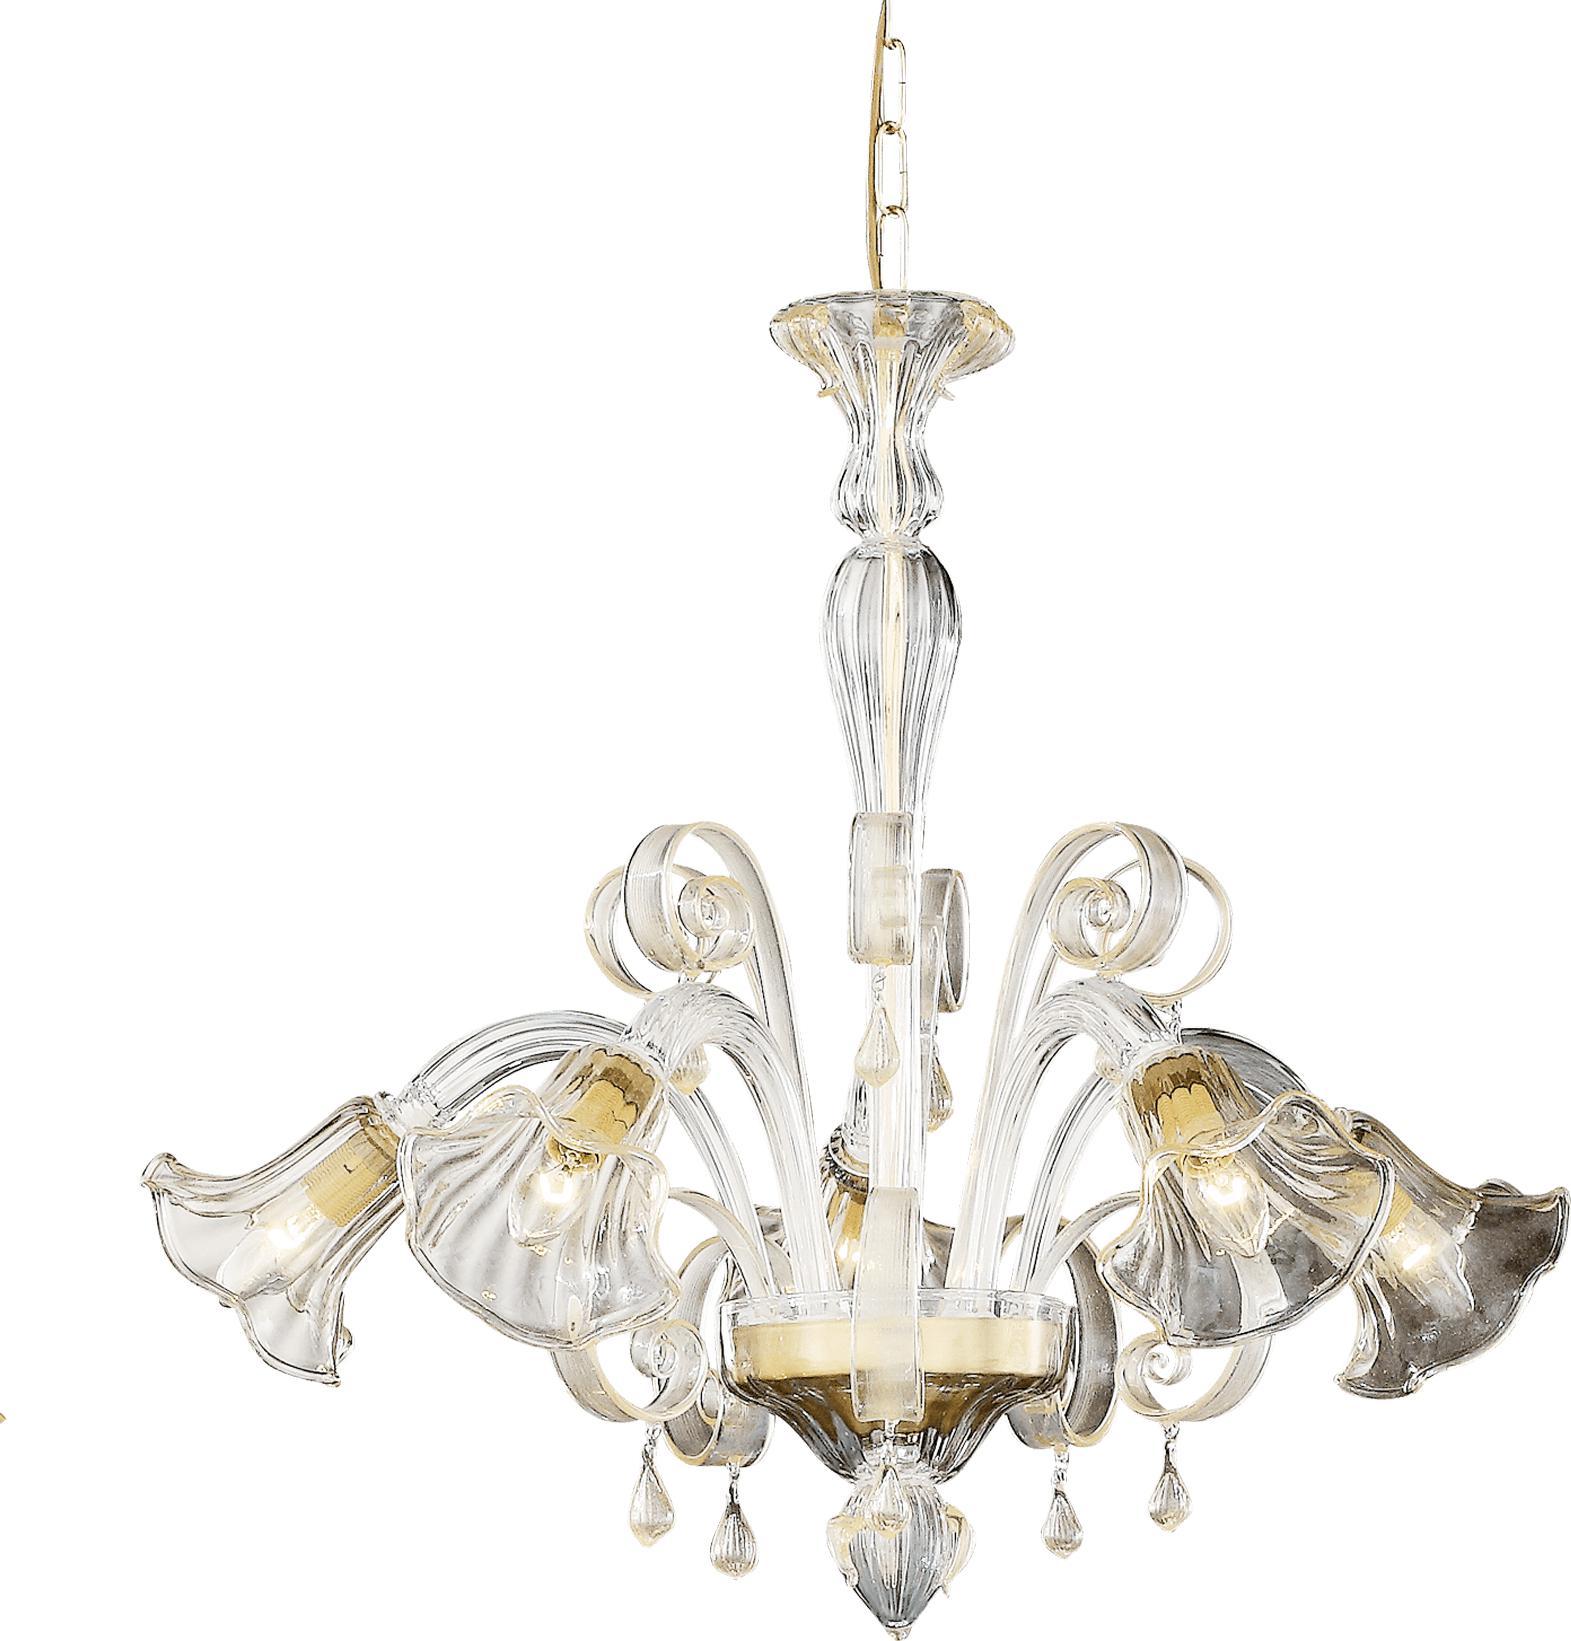 Ideal lux LED Ca doro Kronleuchter 5x5W 20969